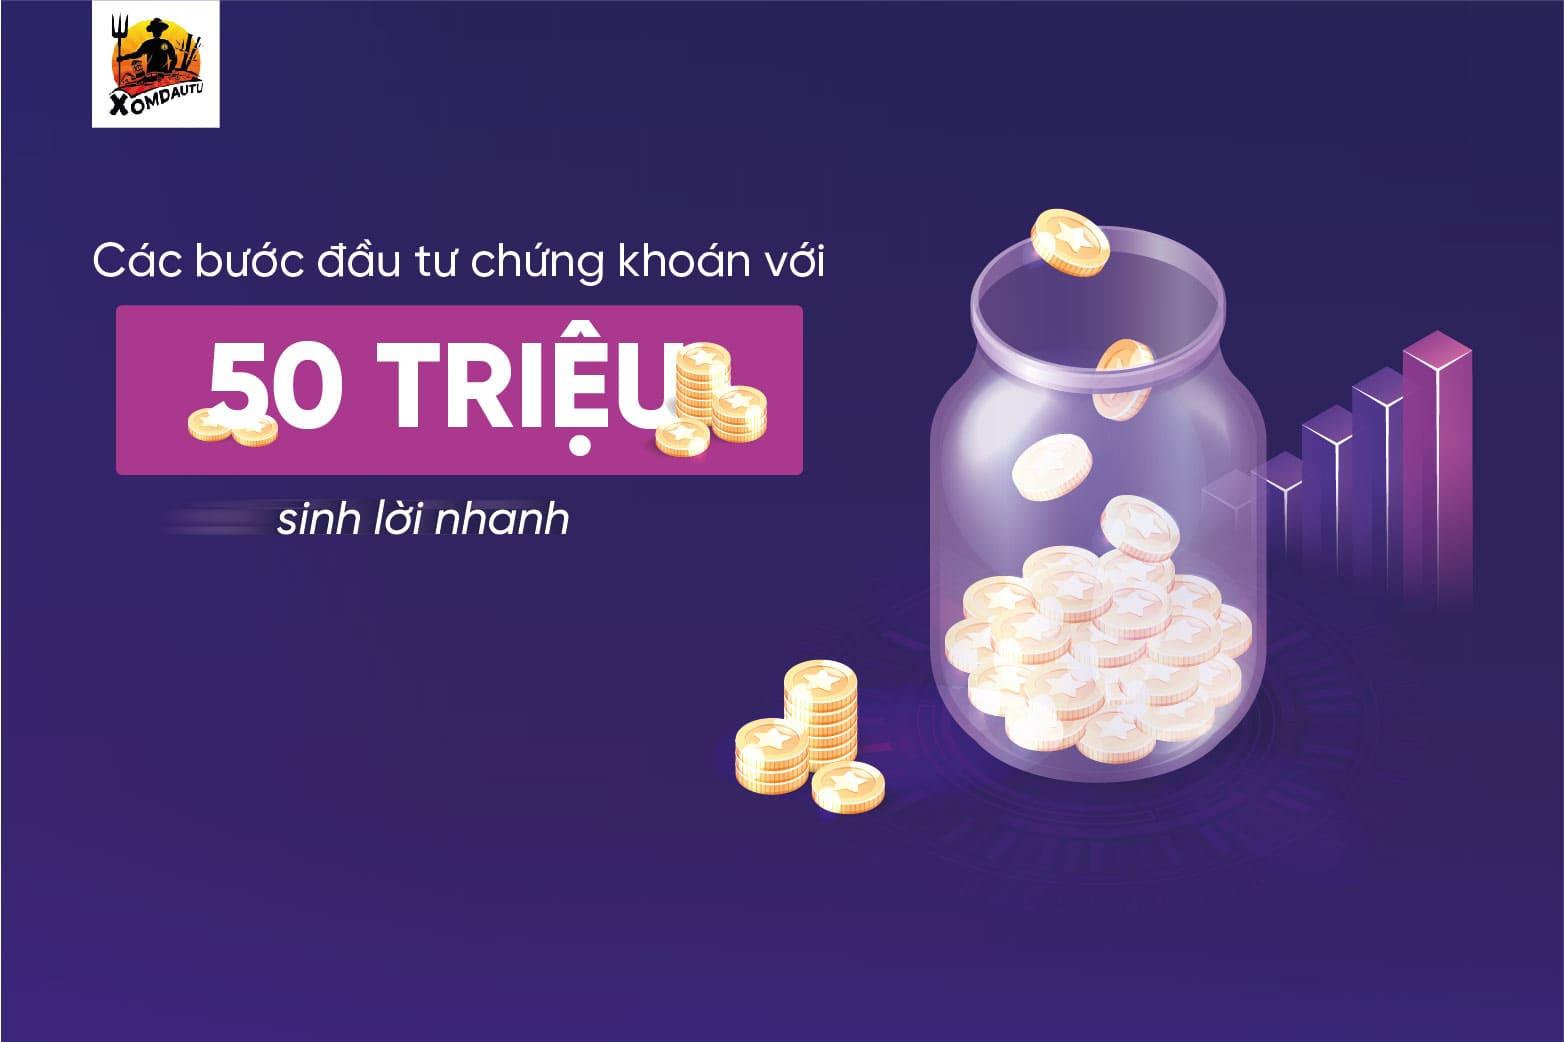 Cac Buoc Dau Tu Chung Khoan